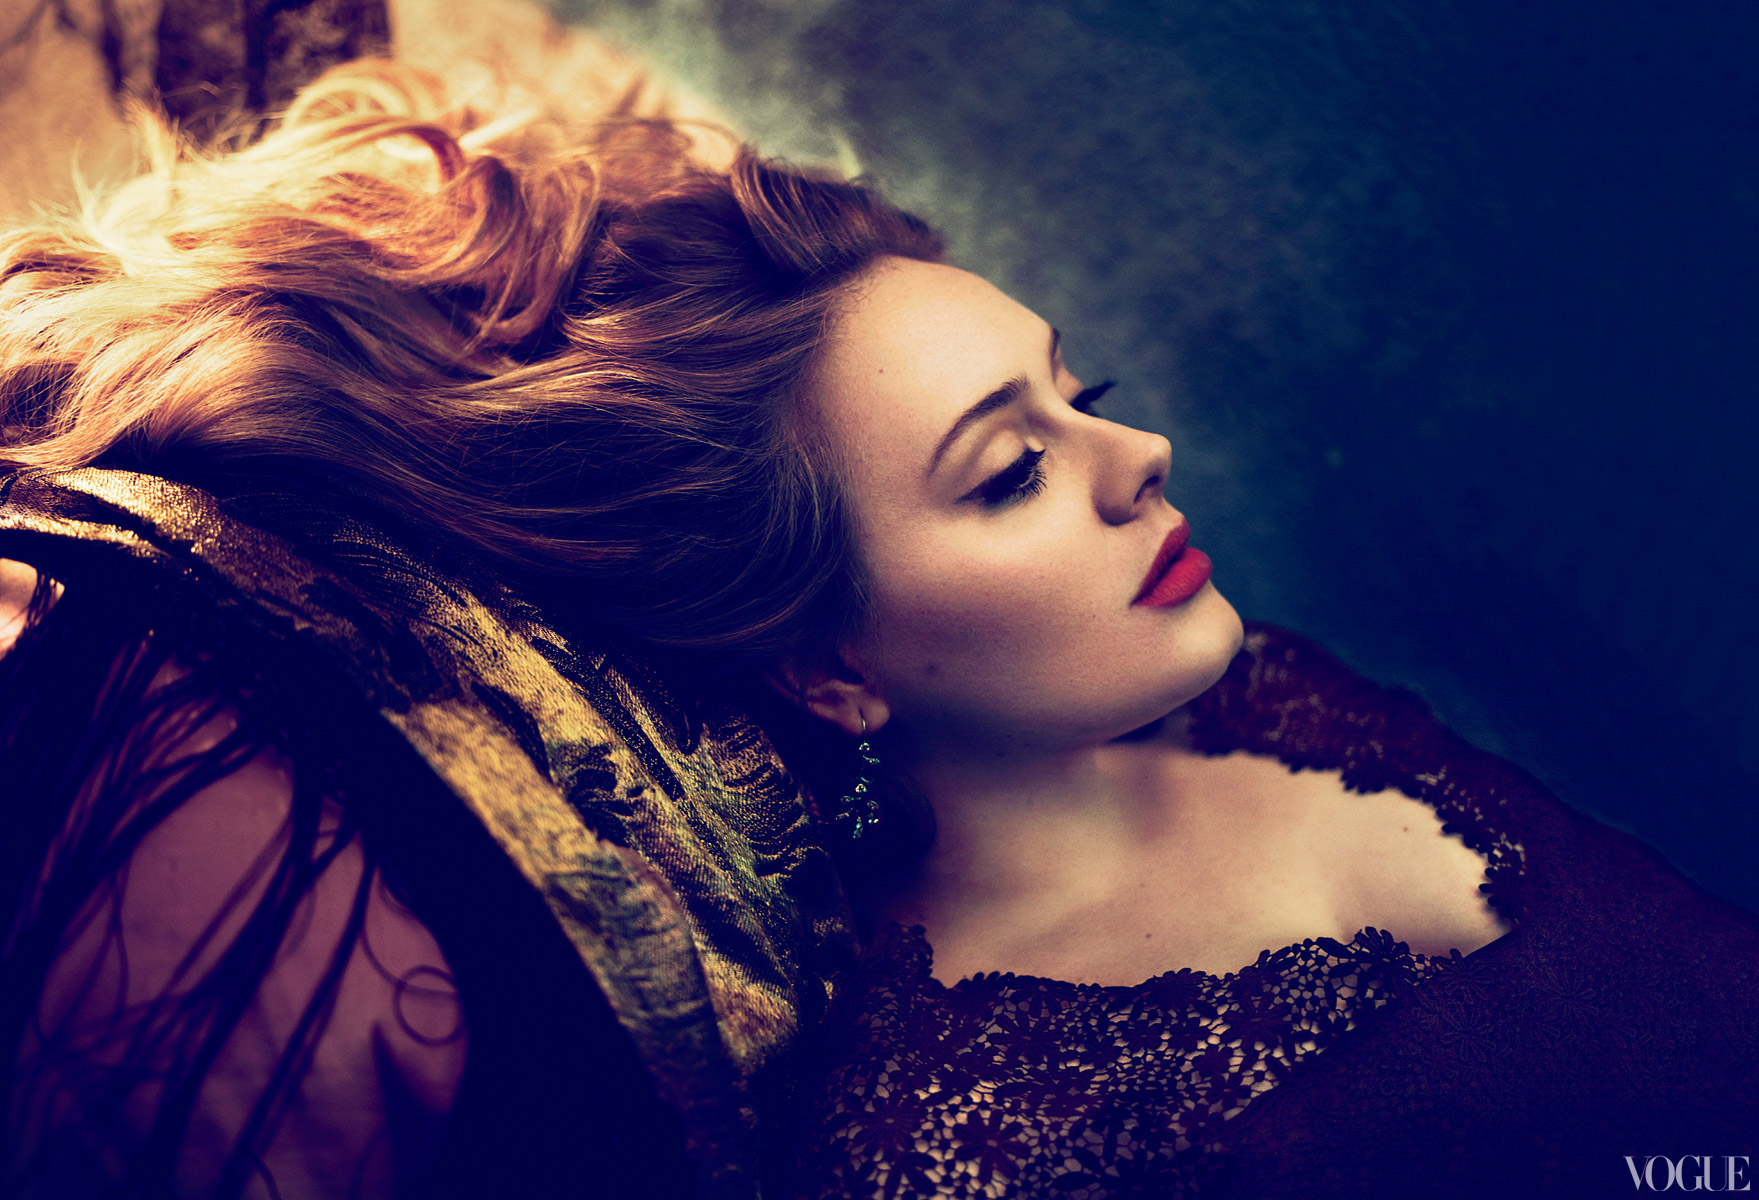 Adele-Vogue-6